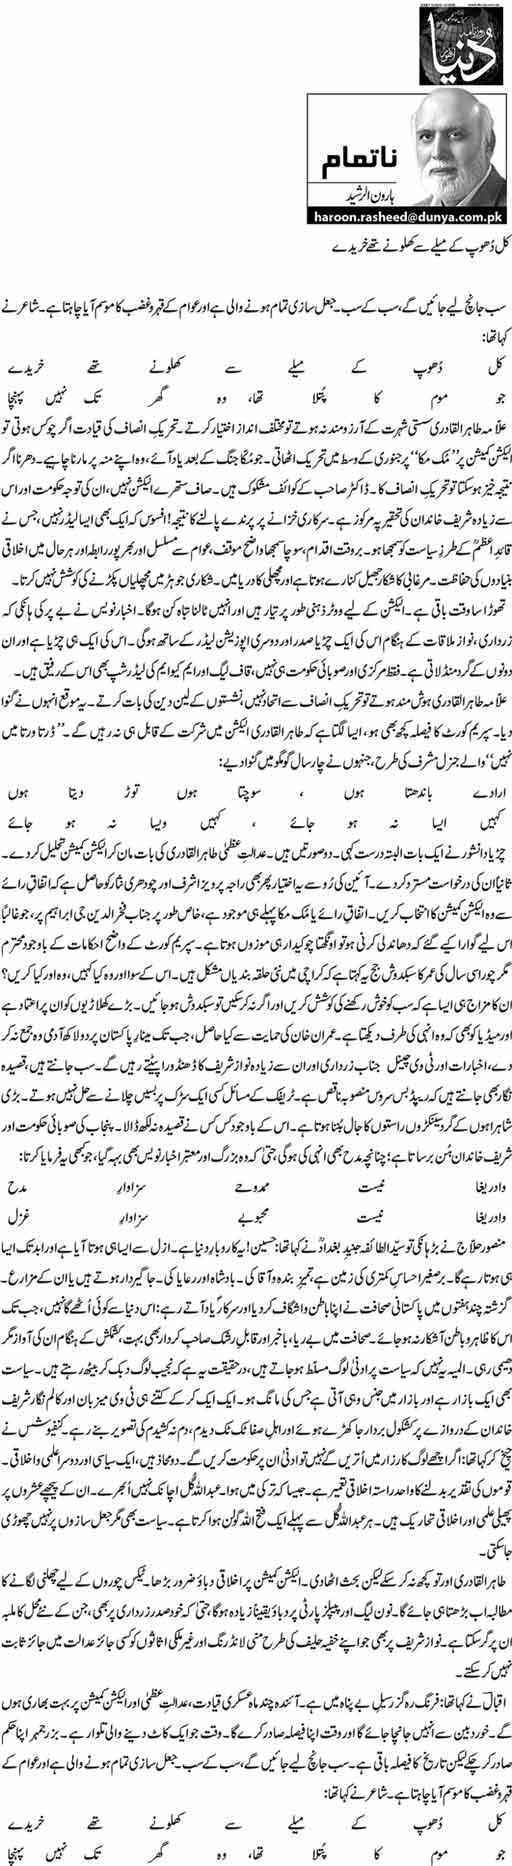 Kal dhoop k meelay se khilonay thay khareeday - Haroon-ur-Rahseed